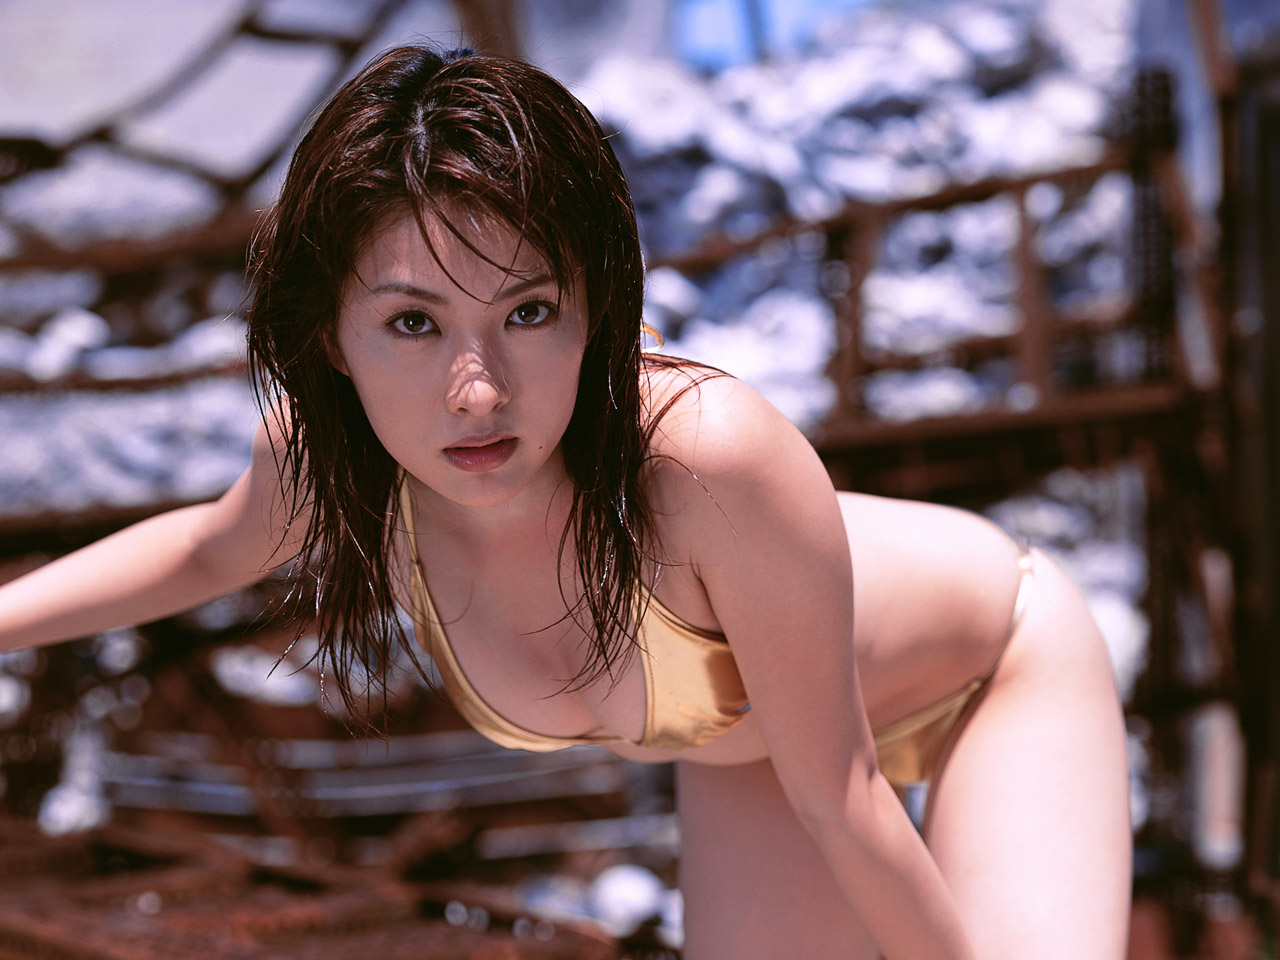 gadis cantik sexy bugil hot foto bugil bintang fim porno